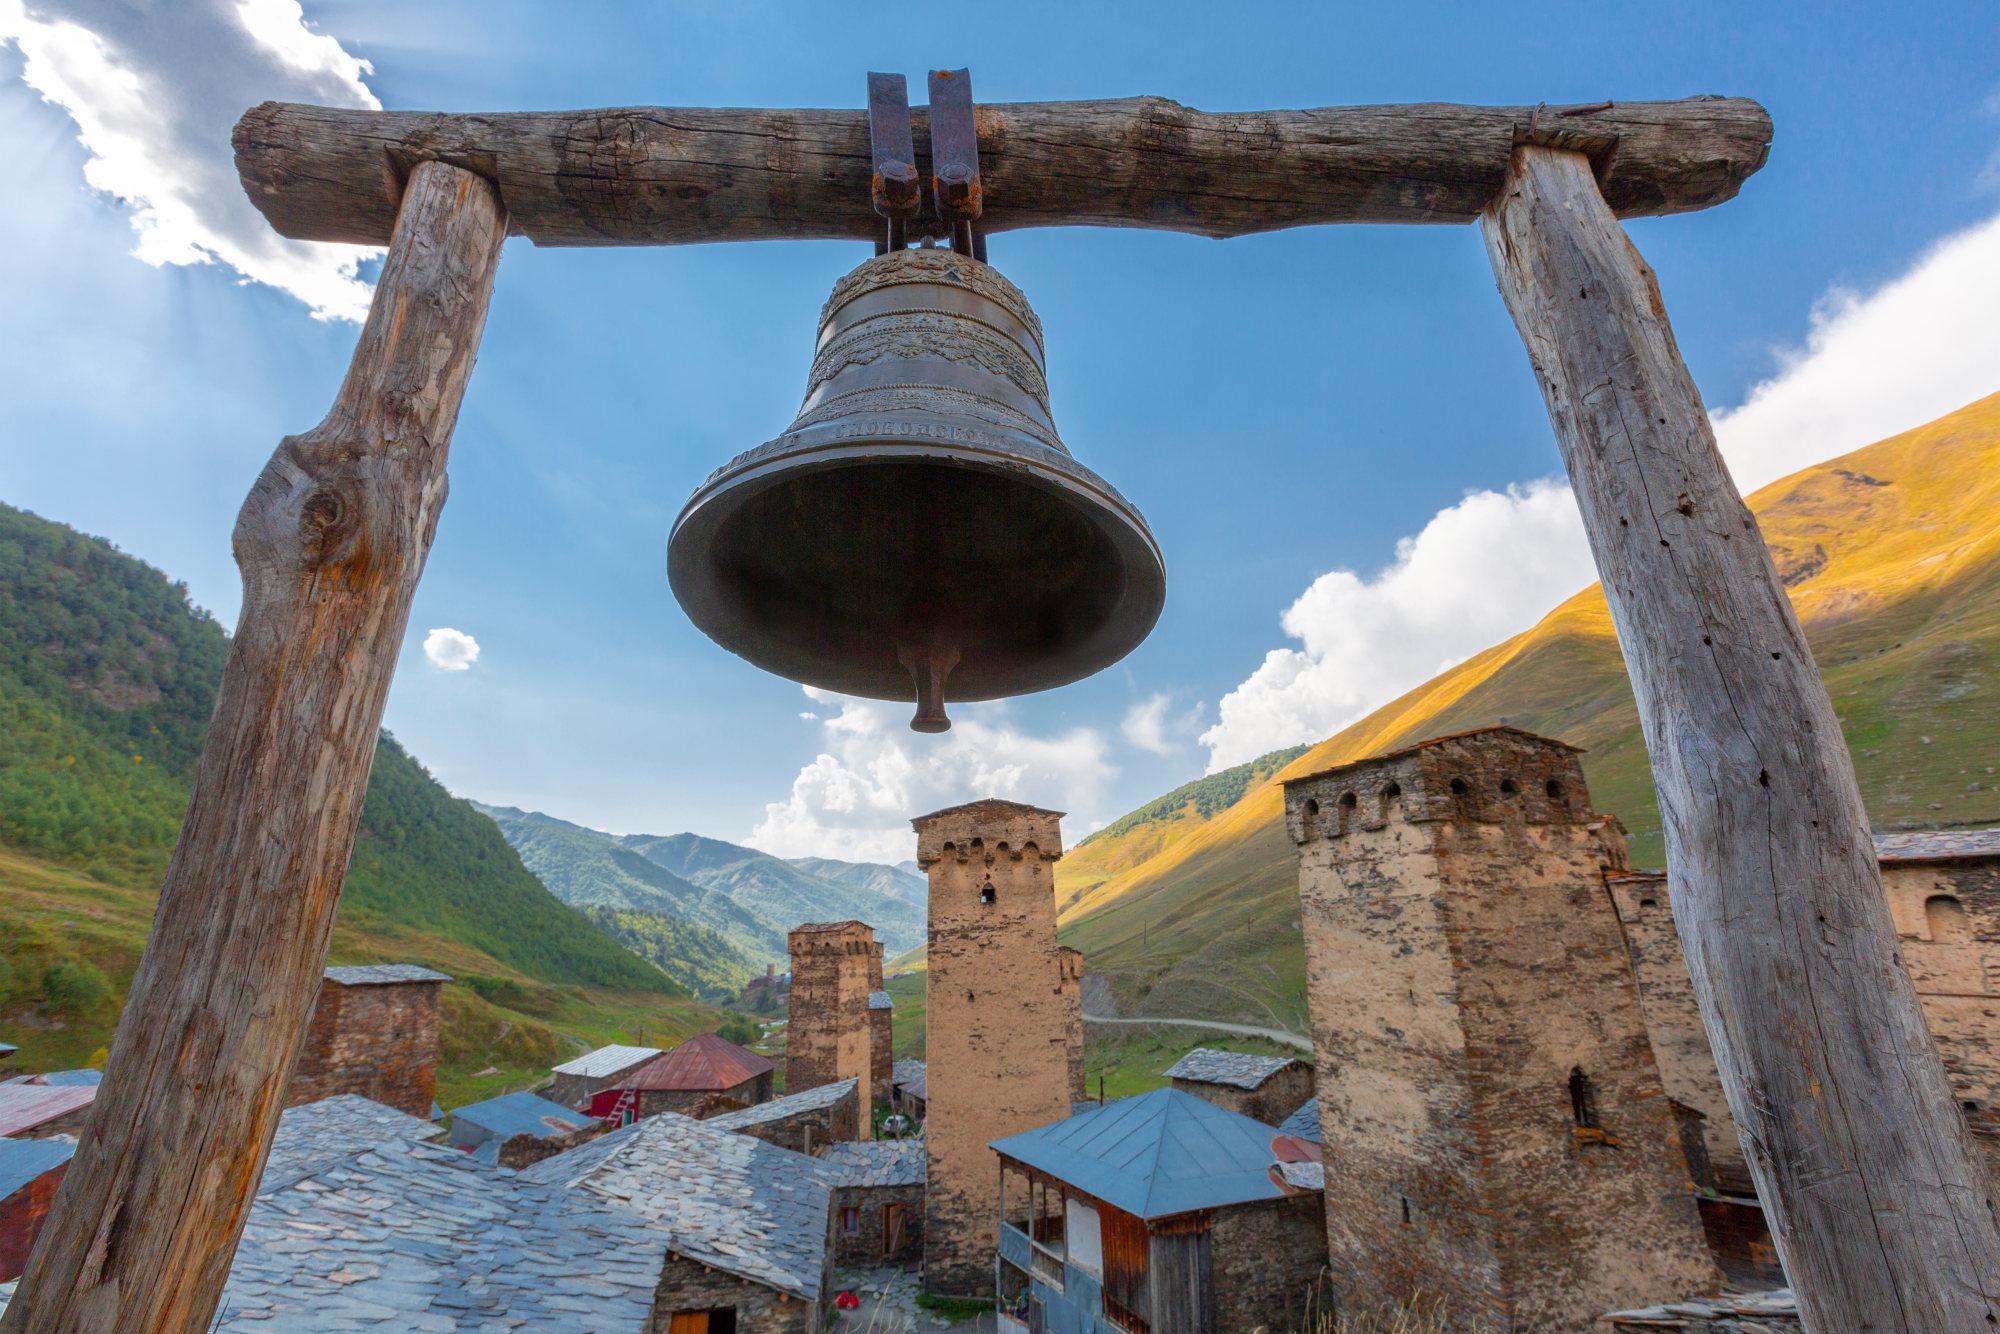 Church bells of an Orthodox Christian church